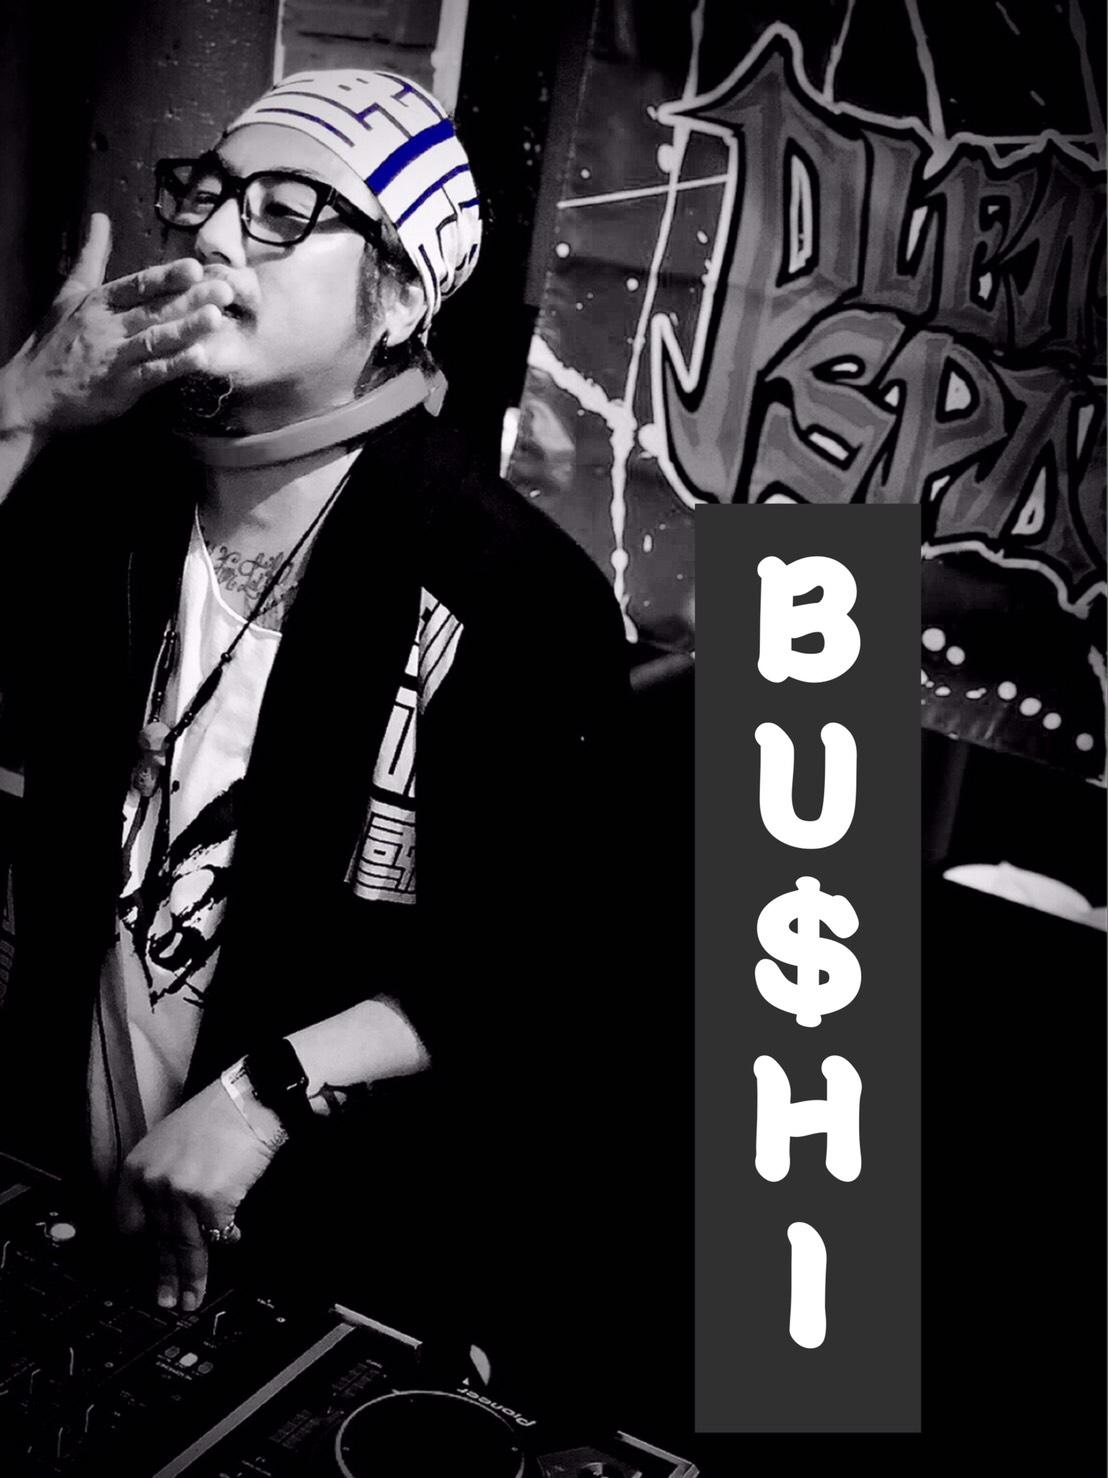 BU$HI